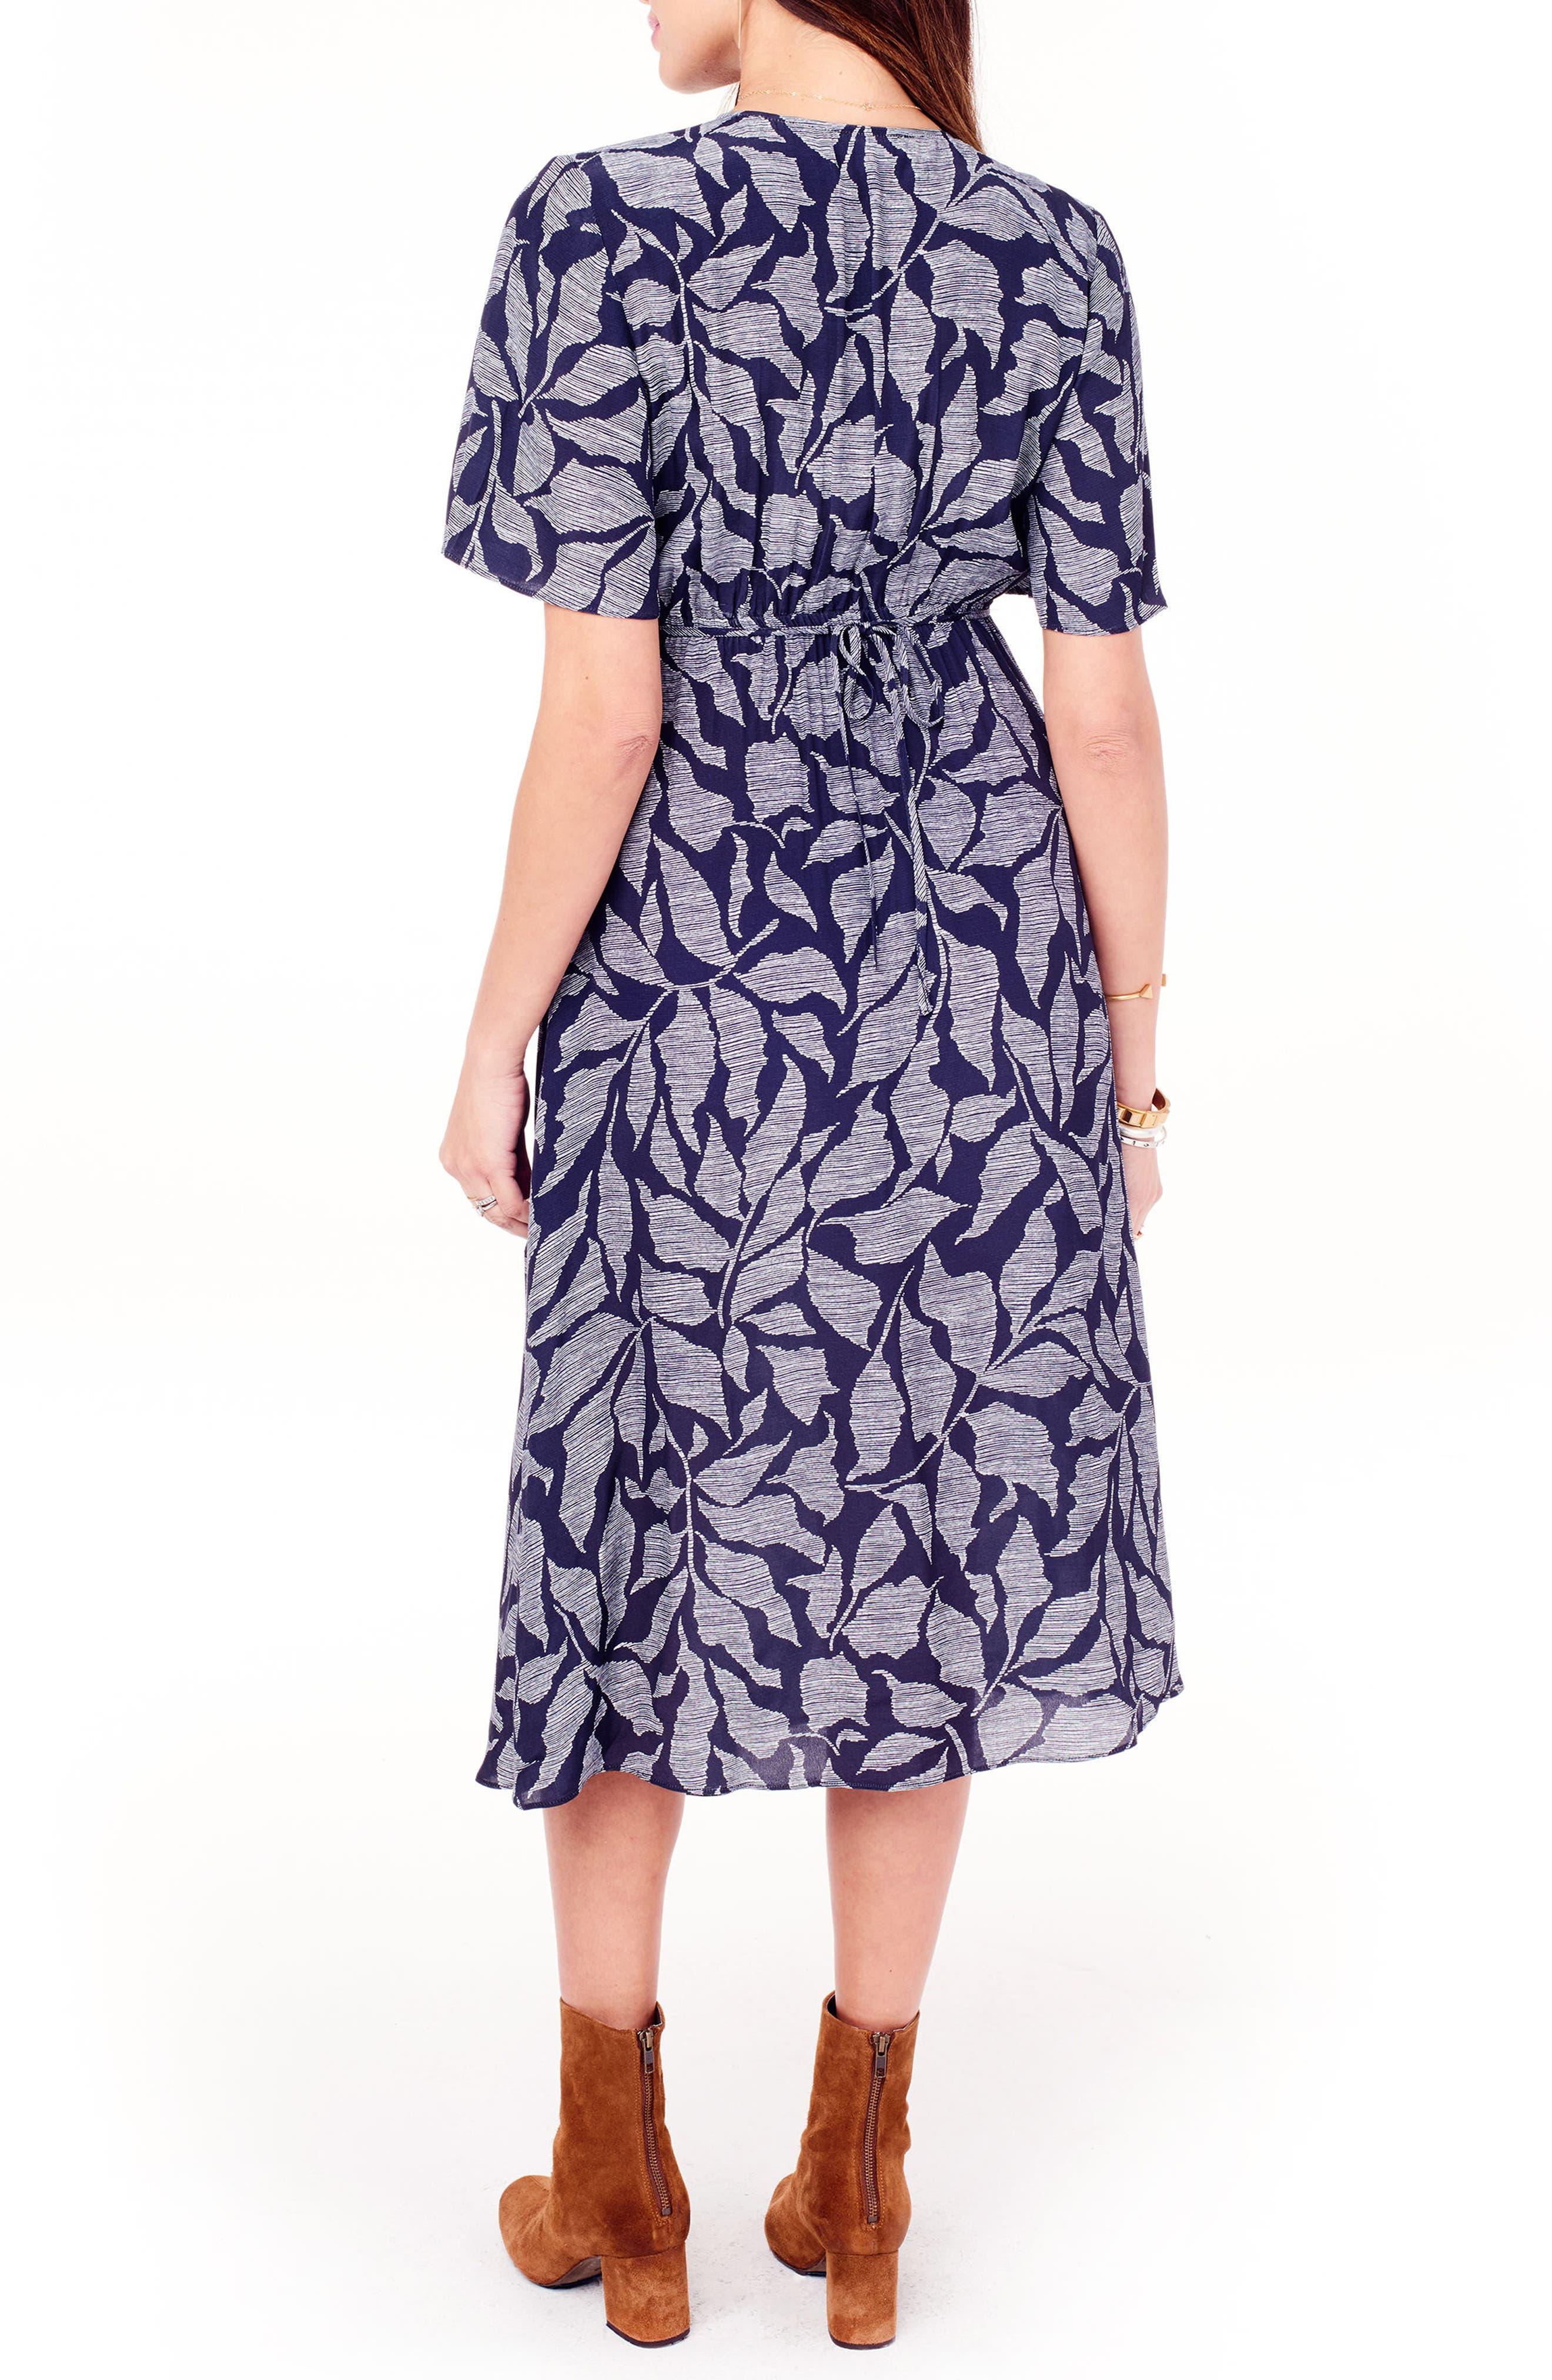 Flutter Sleeve Faux Wrap Maternity Dress,                             Alternate thumbnail 2, color,                             Navy Leaf Print